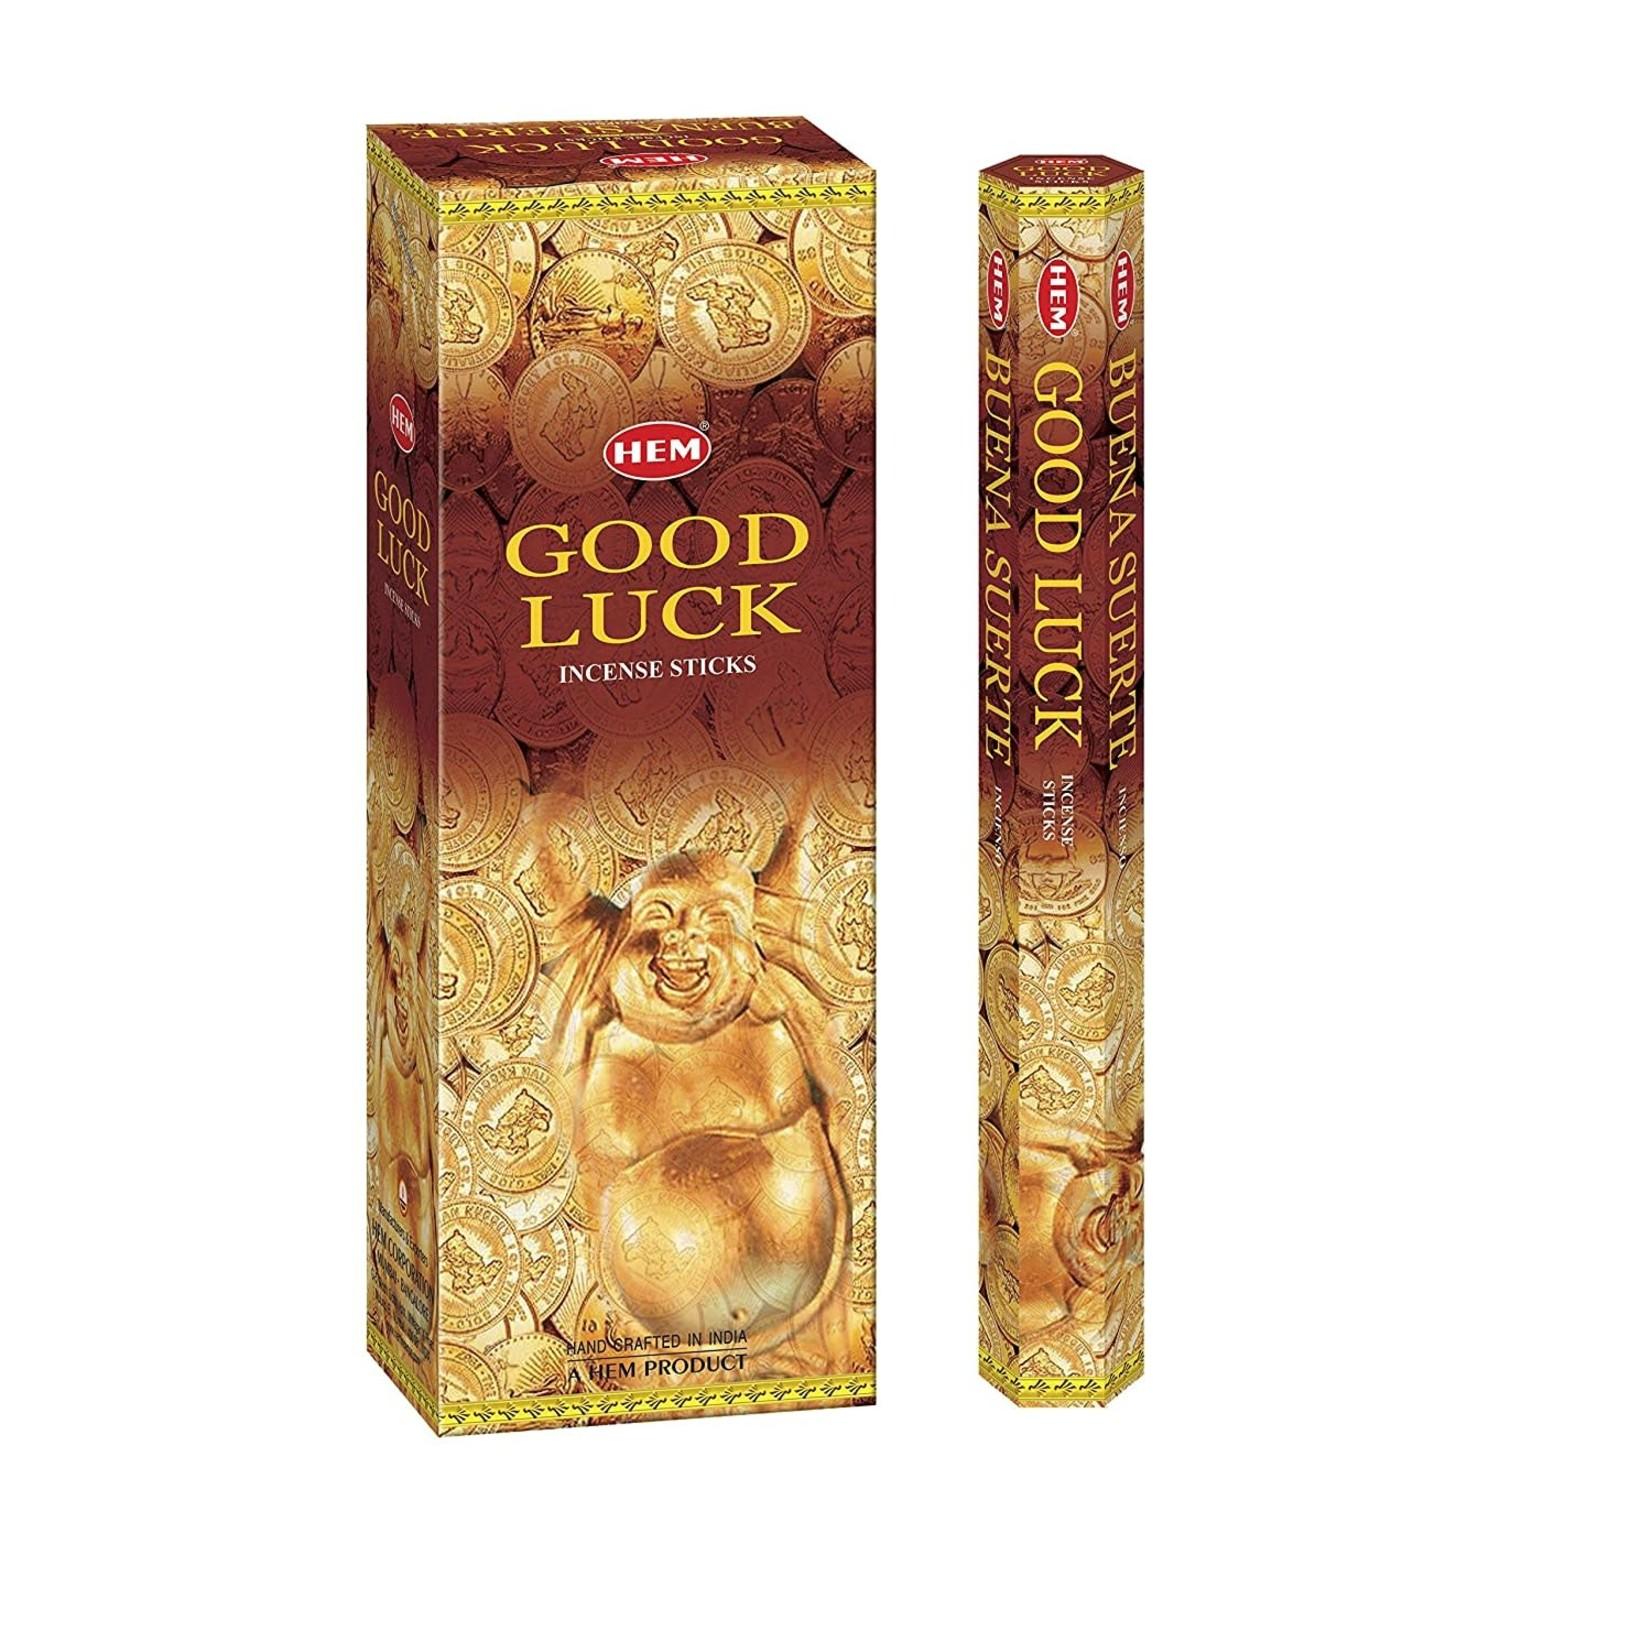 Good Luck Incense Sticks - HEM